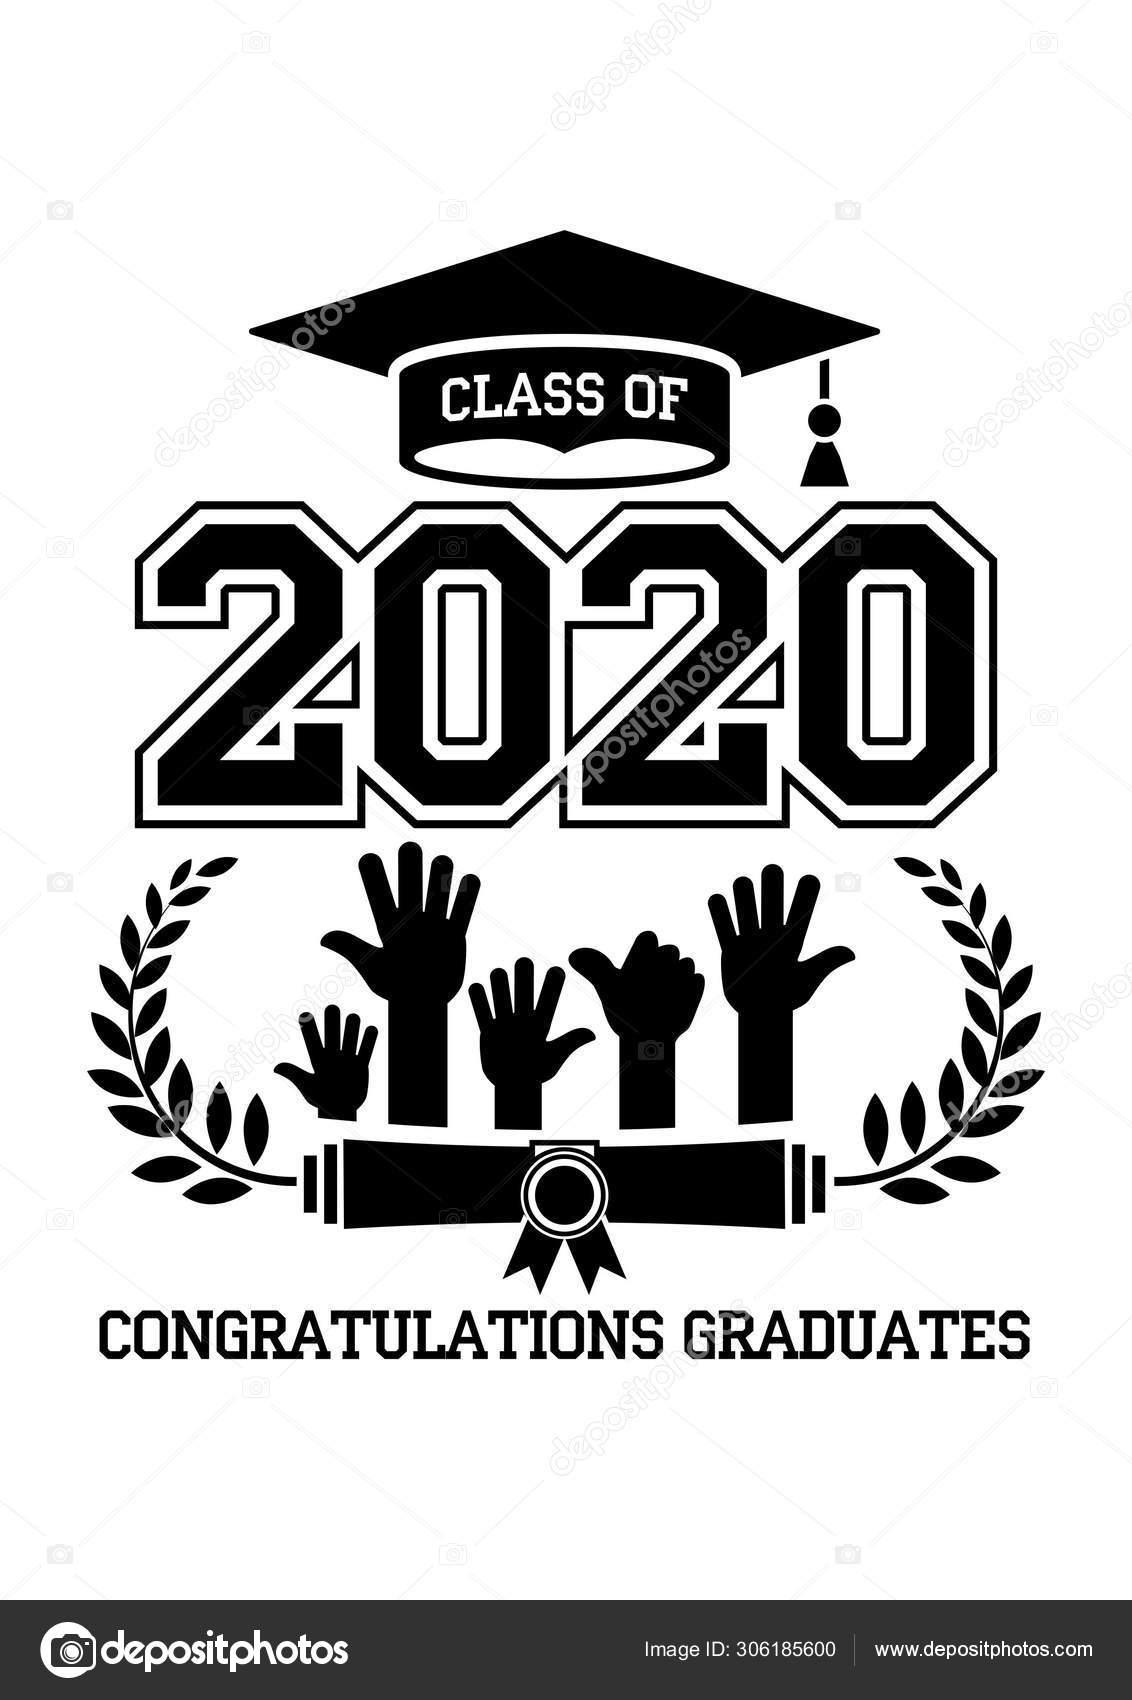 Graduation Schedule 2020.2020 High School Graduation Class Stock Vector C Virtis